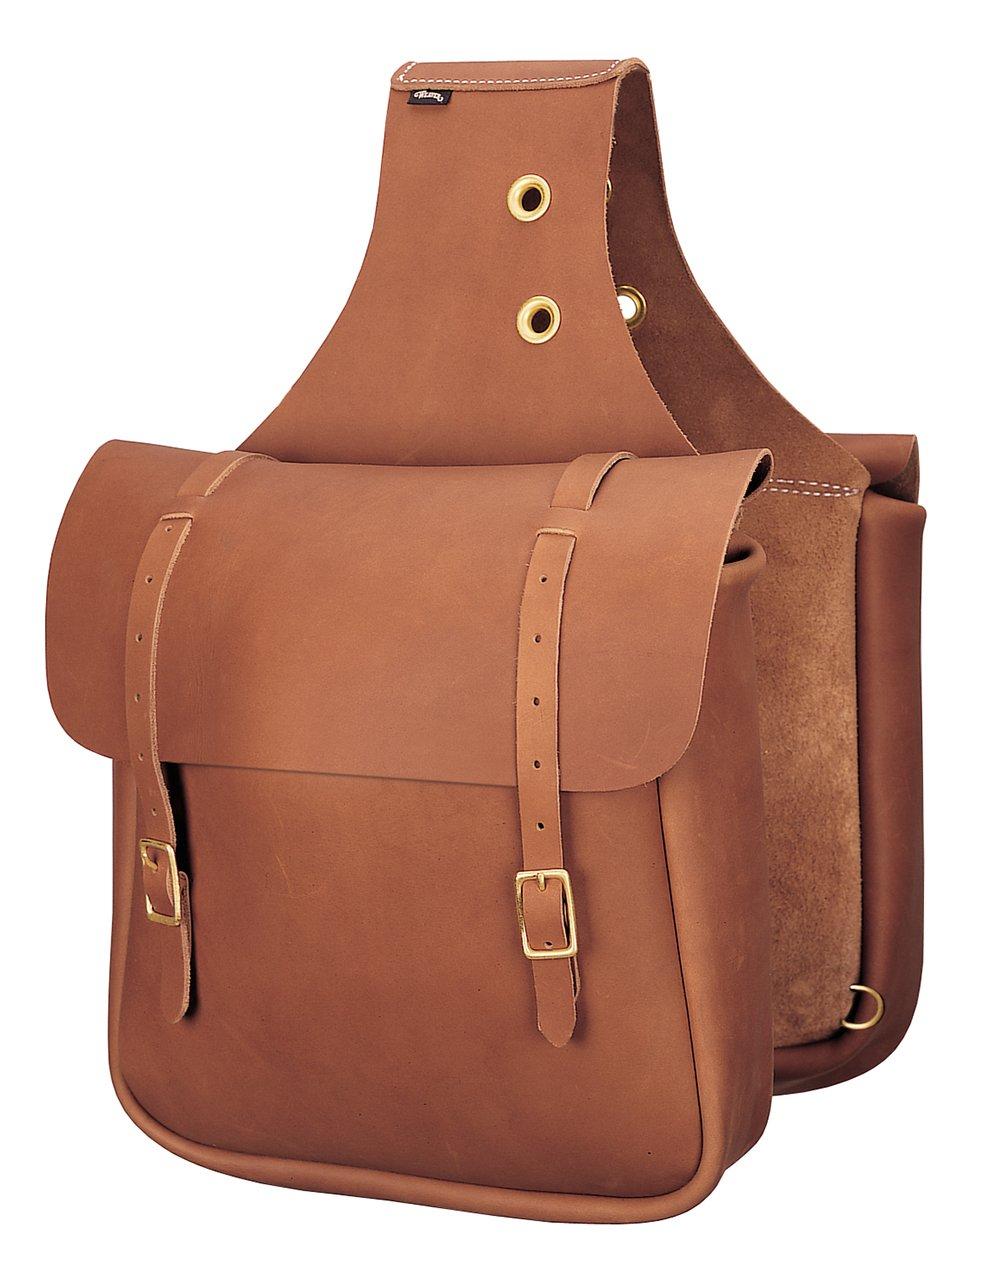 6c6e1cb1455f Amazon.com   Weaver Leather Chap Leather Saddle Bag   Horse Saddle  Accessories   Sports   Outdoors